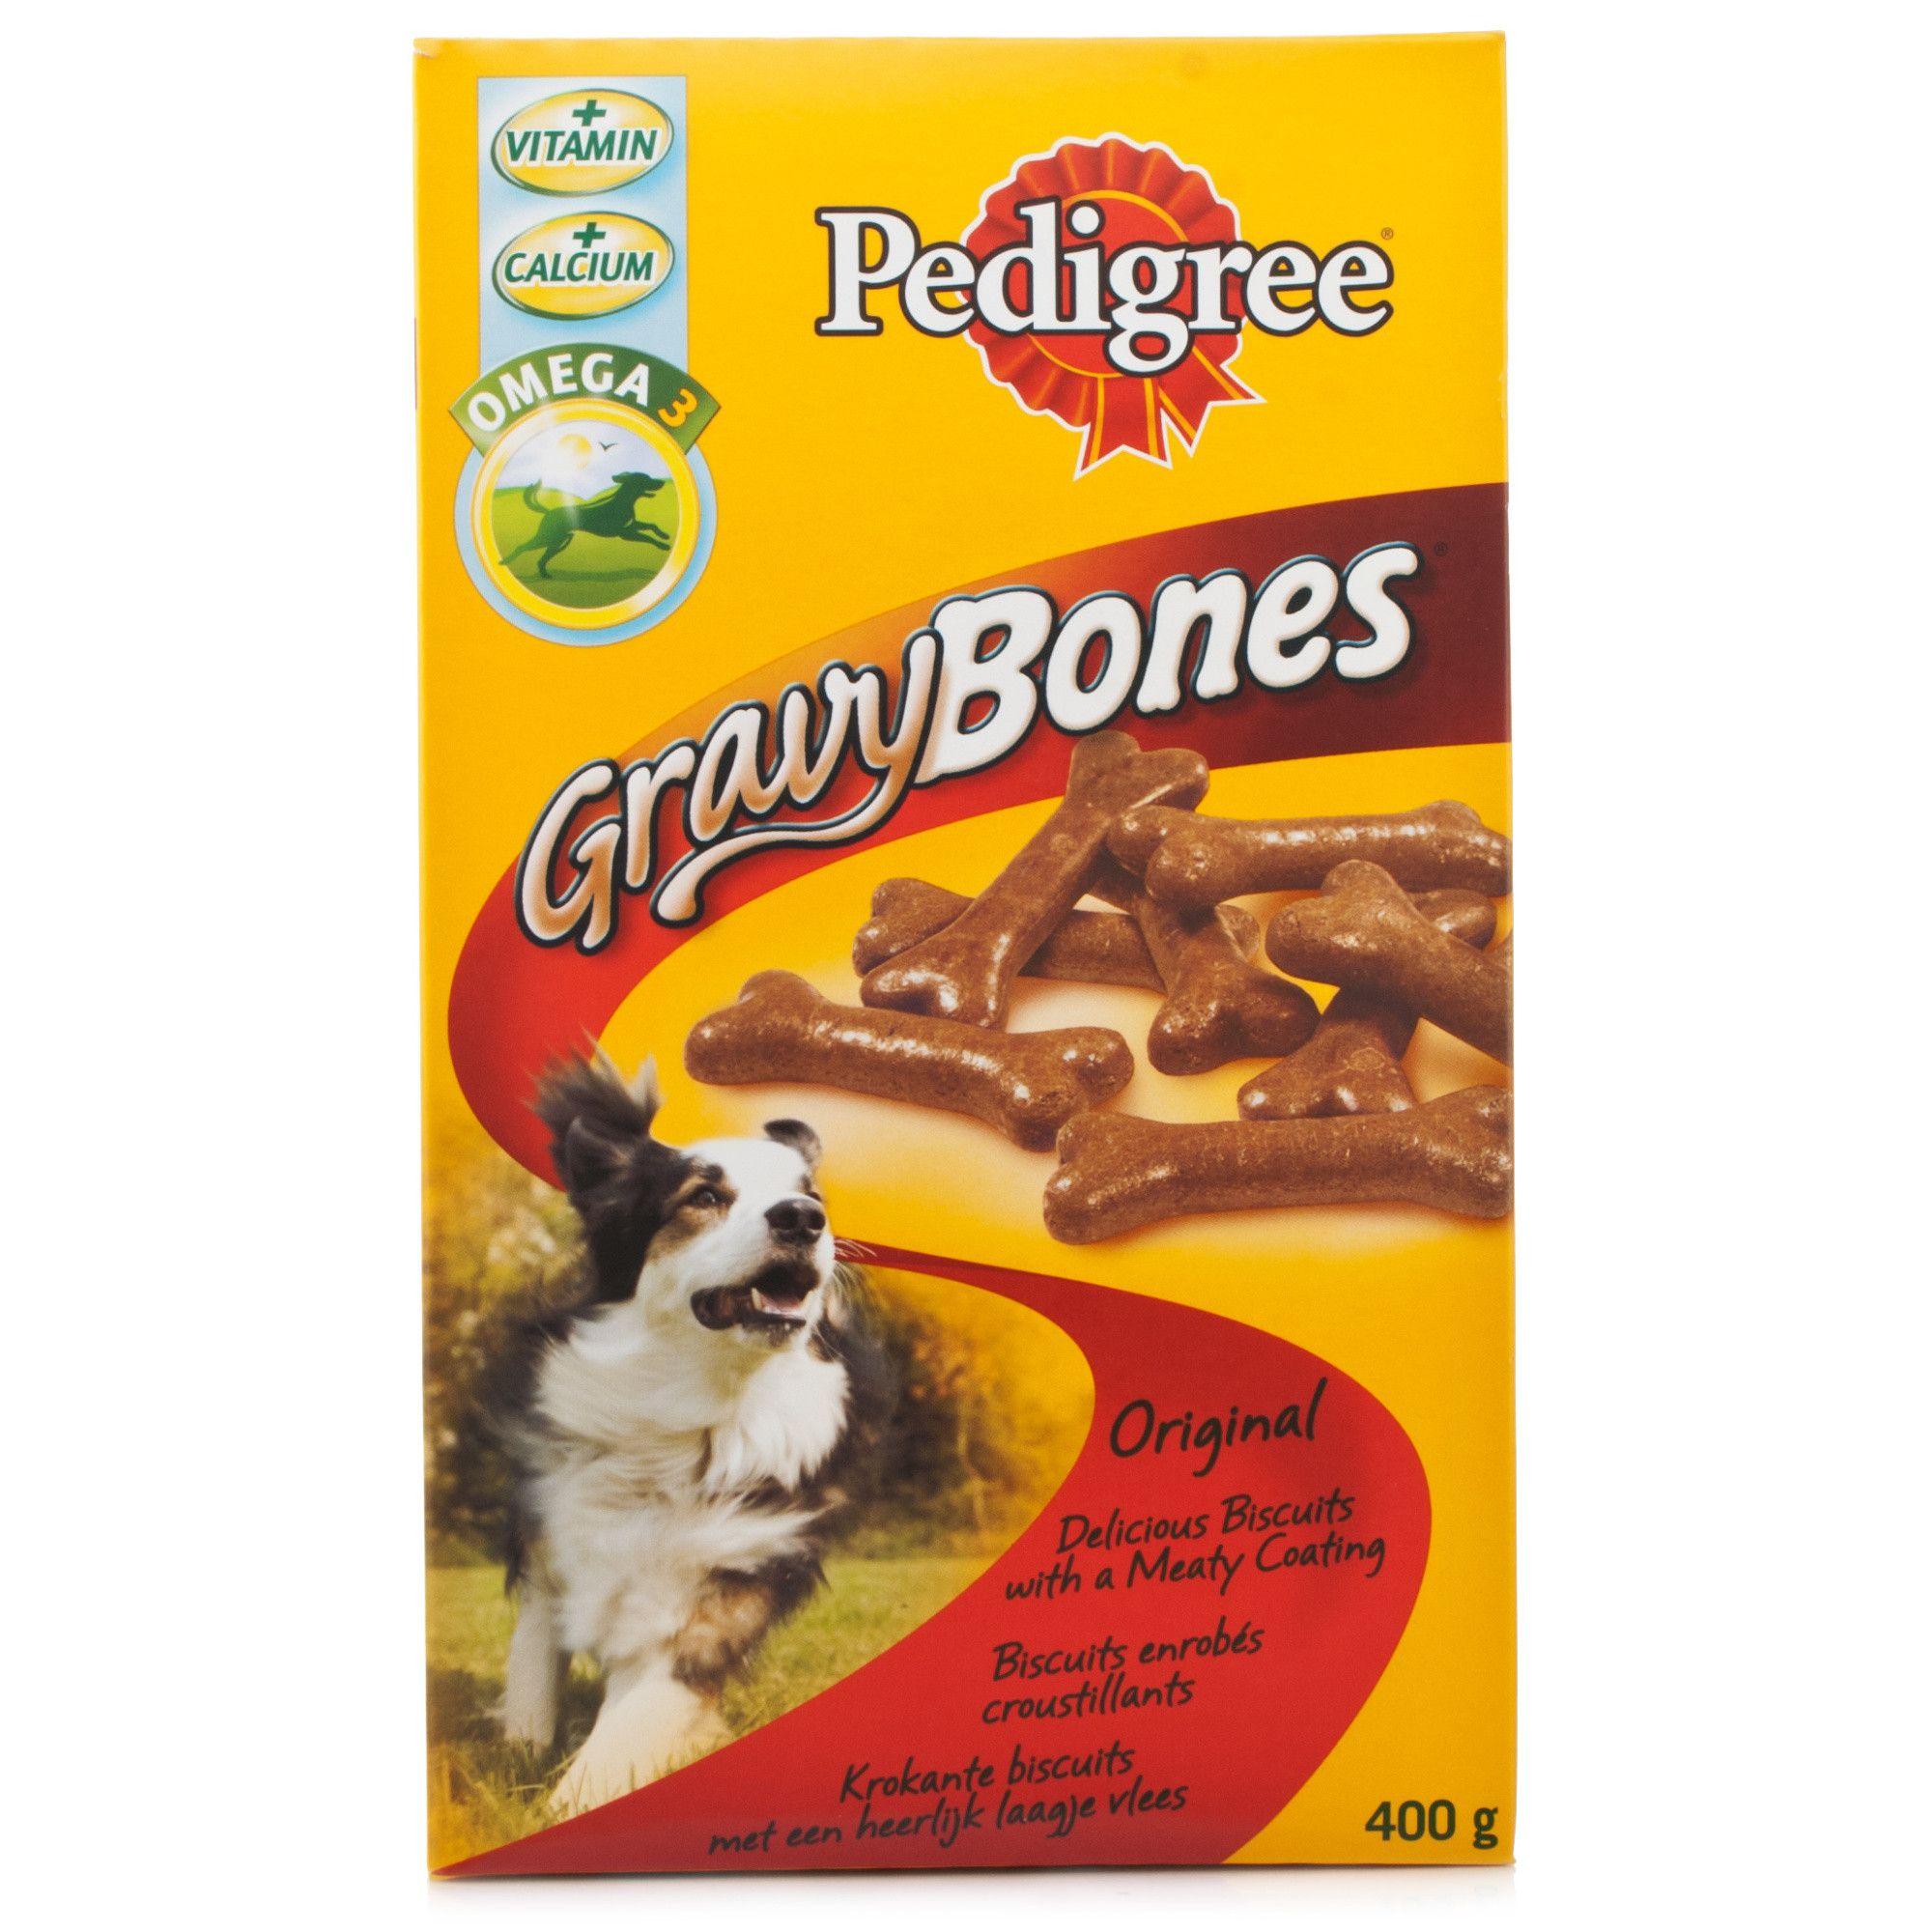 Pedigree Gravy Bones Pedigree In 2019 Dogs Dog Food Recipes